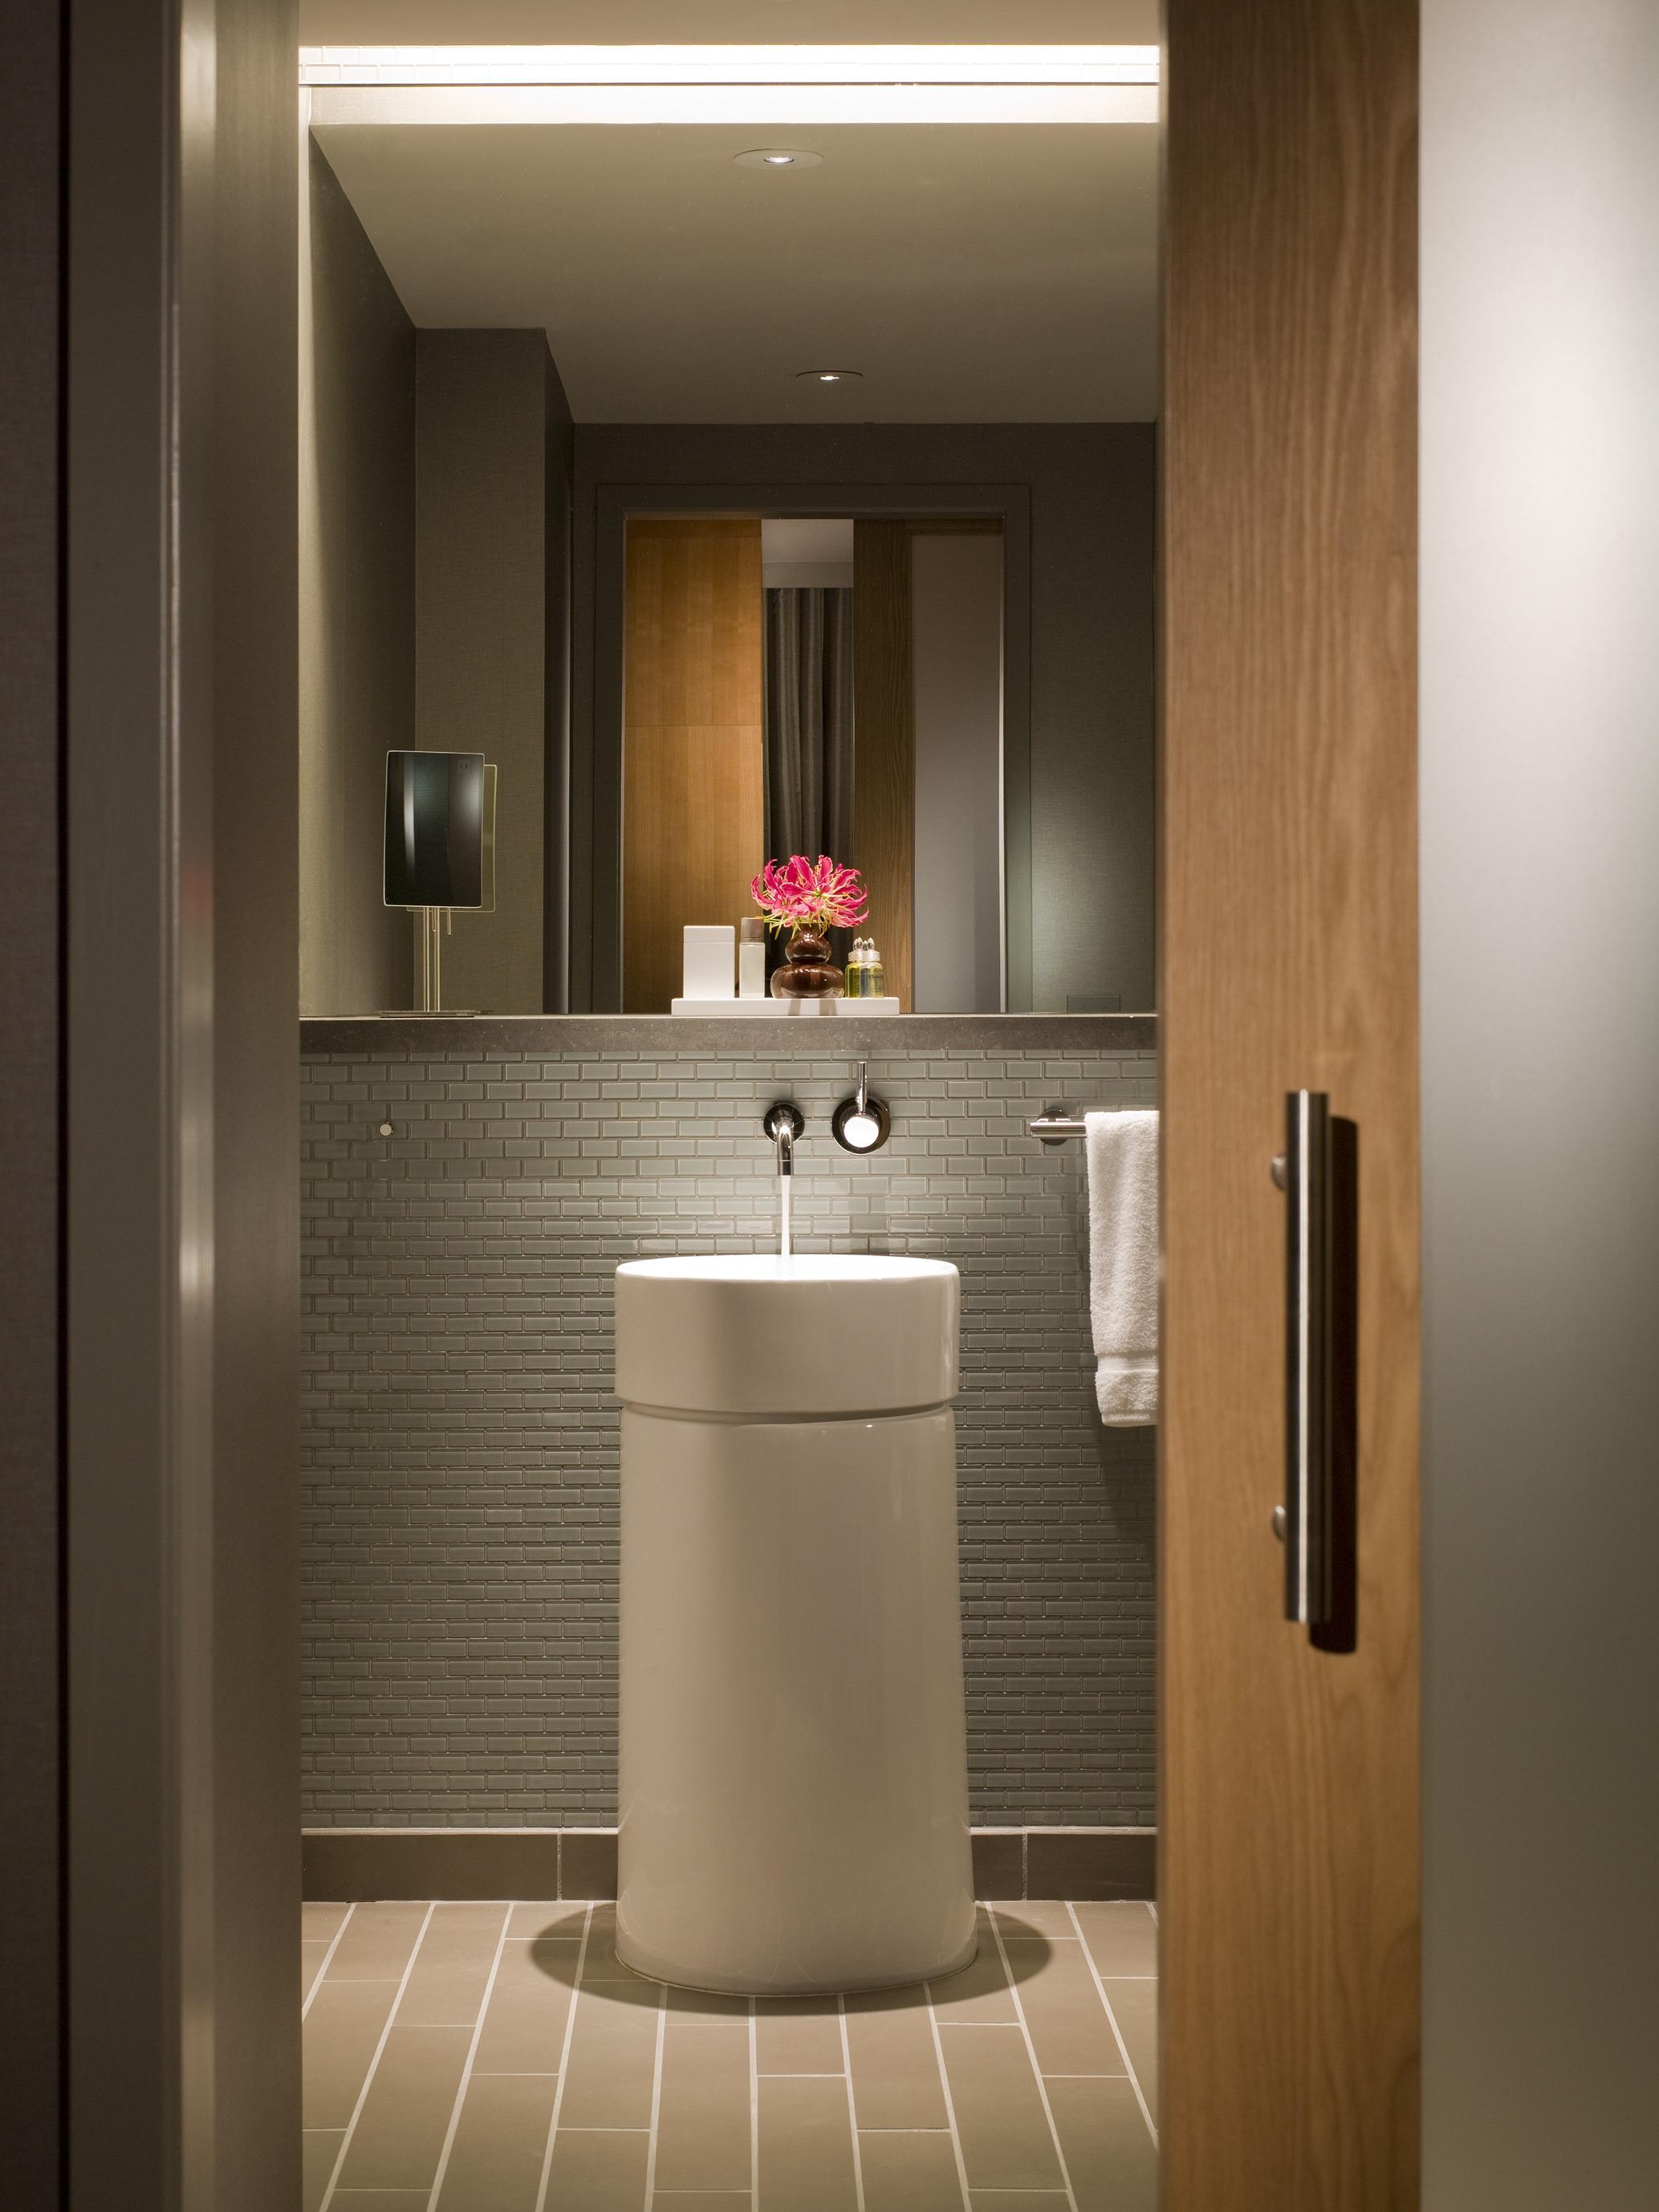 Intercontinental Chicago O'Hare Bathroom